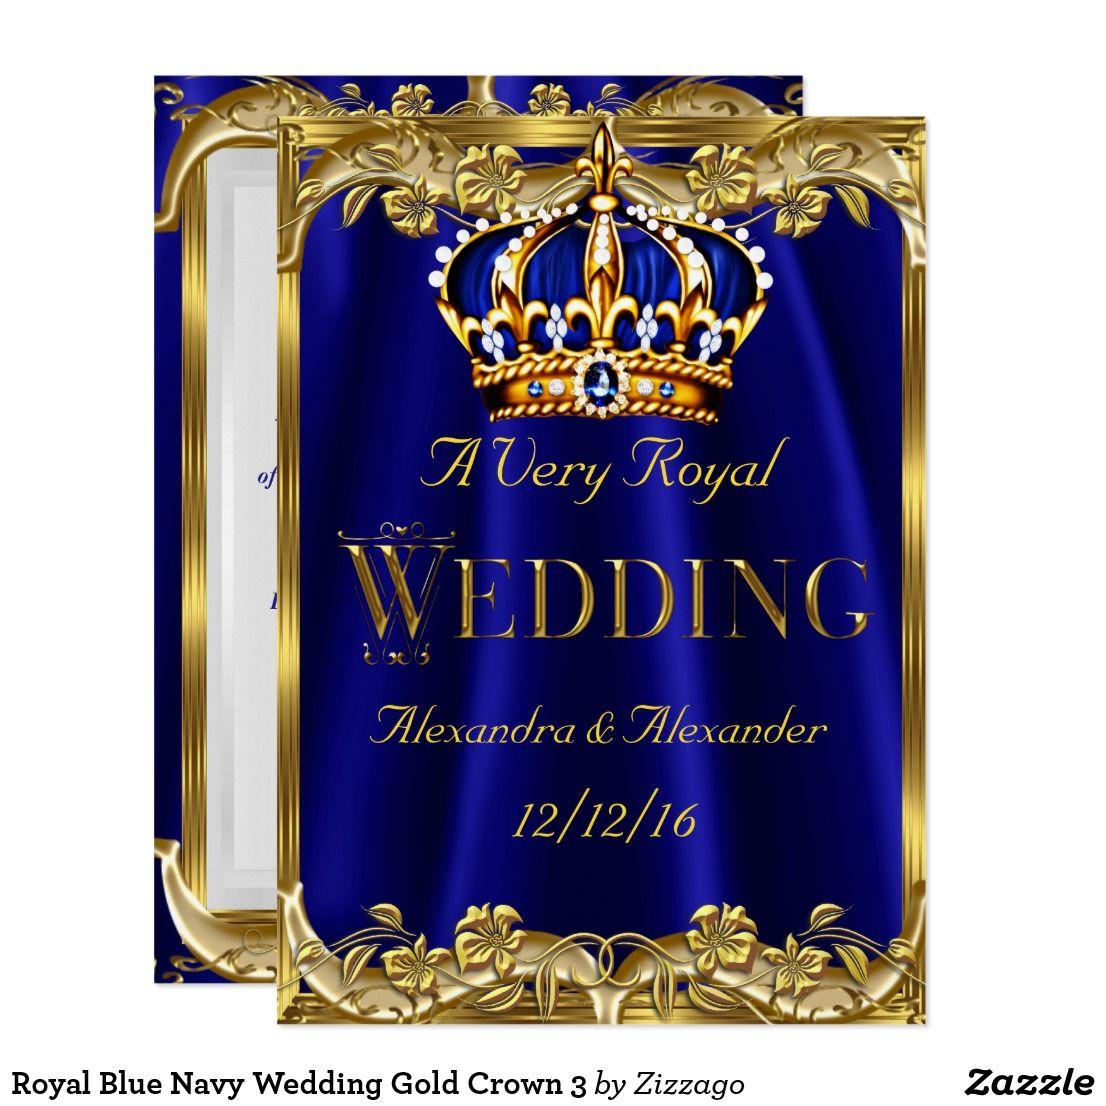 Royal blue navy wedding gold crown card navy weddings gold